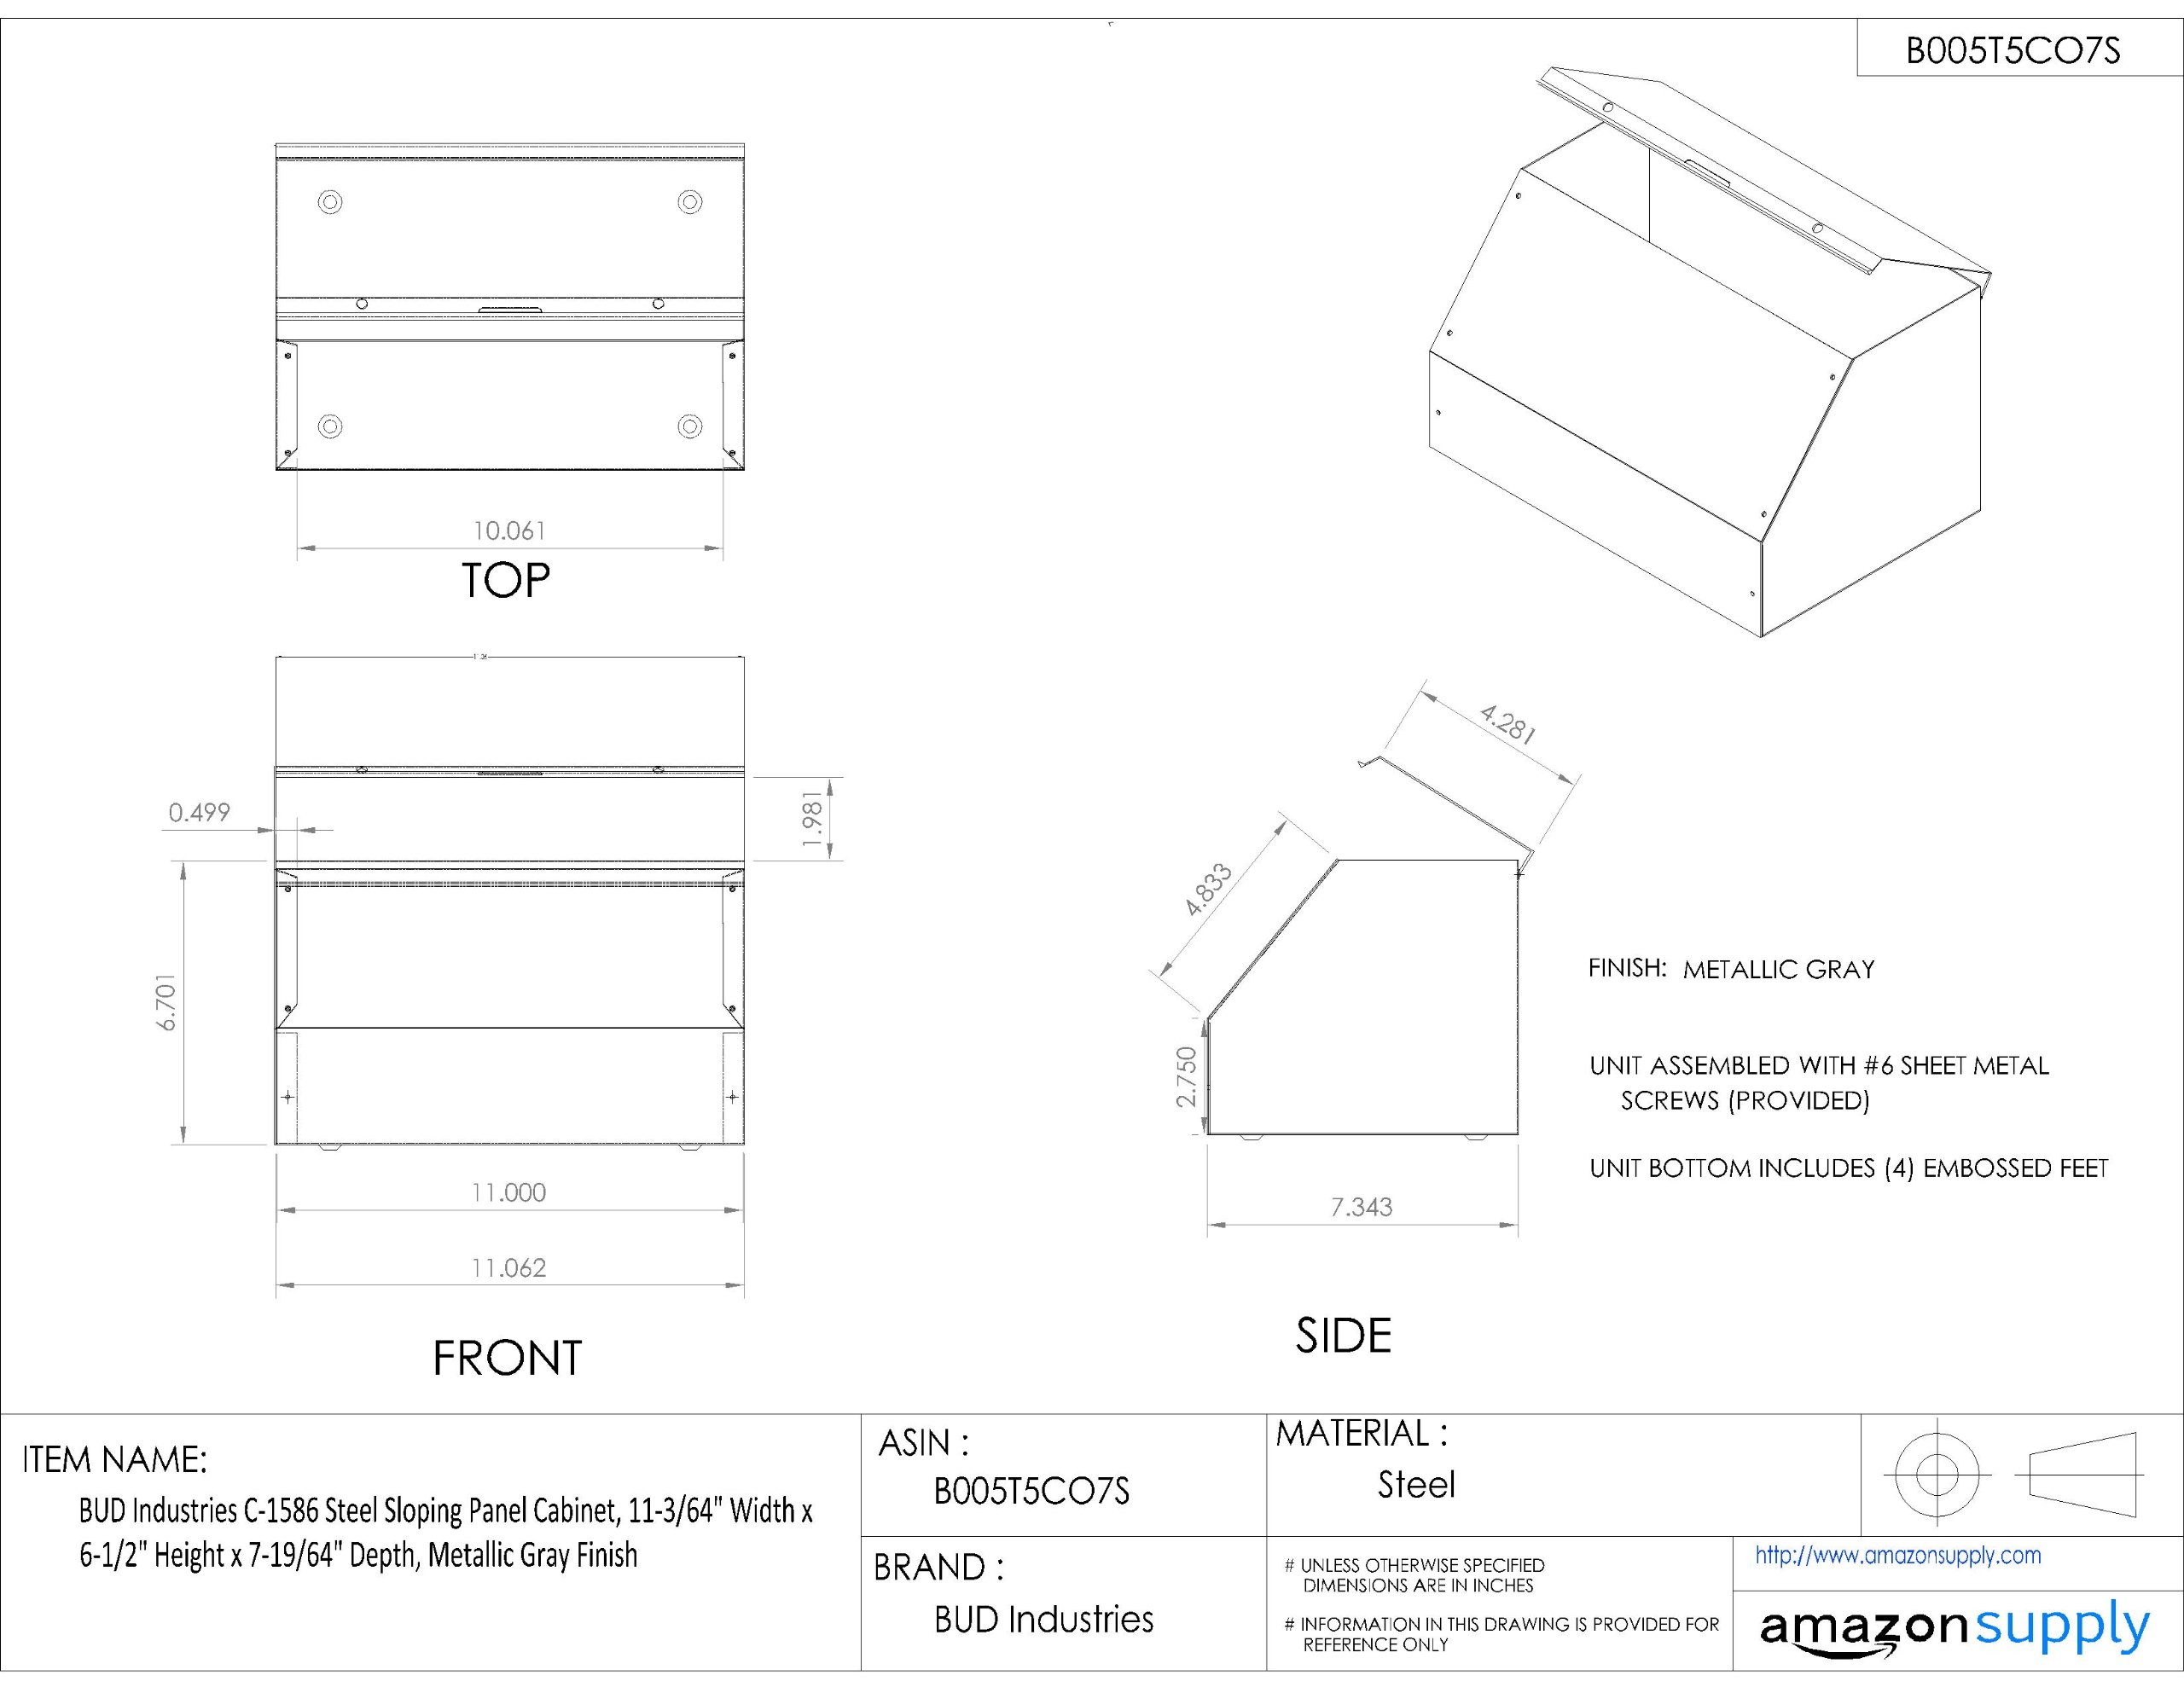 BUD Industries C-1586 Steel Sloping Panel Cabinet, 11-3/64'' Width x 6-1/2'' Height x 7-19/64'' Depth, Metallic Gray Finish